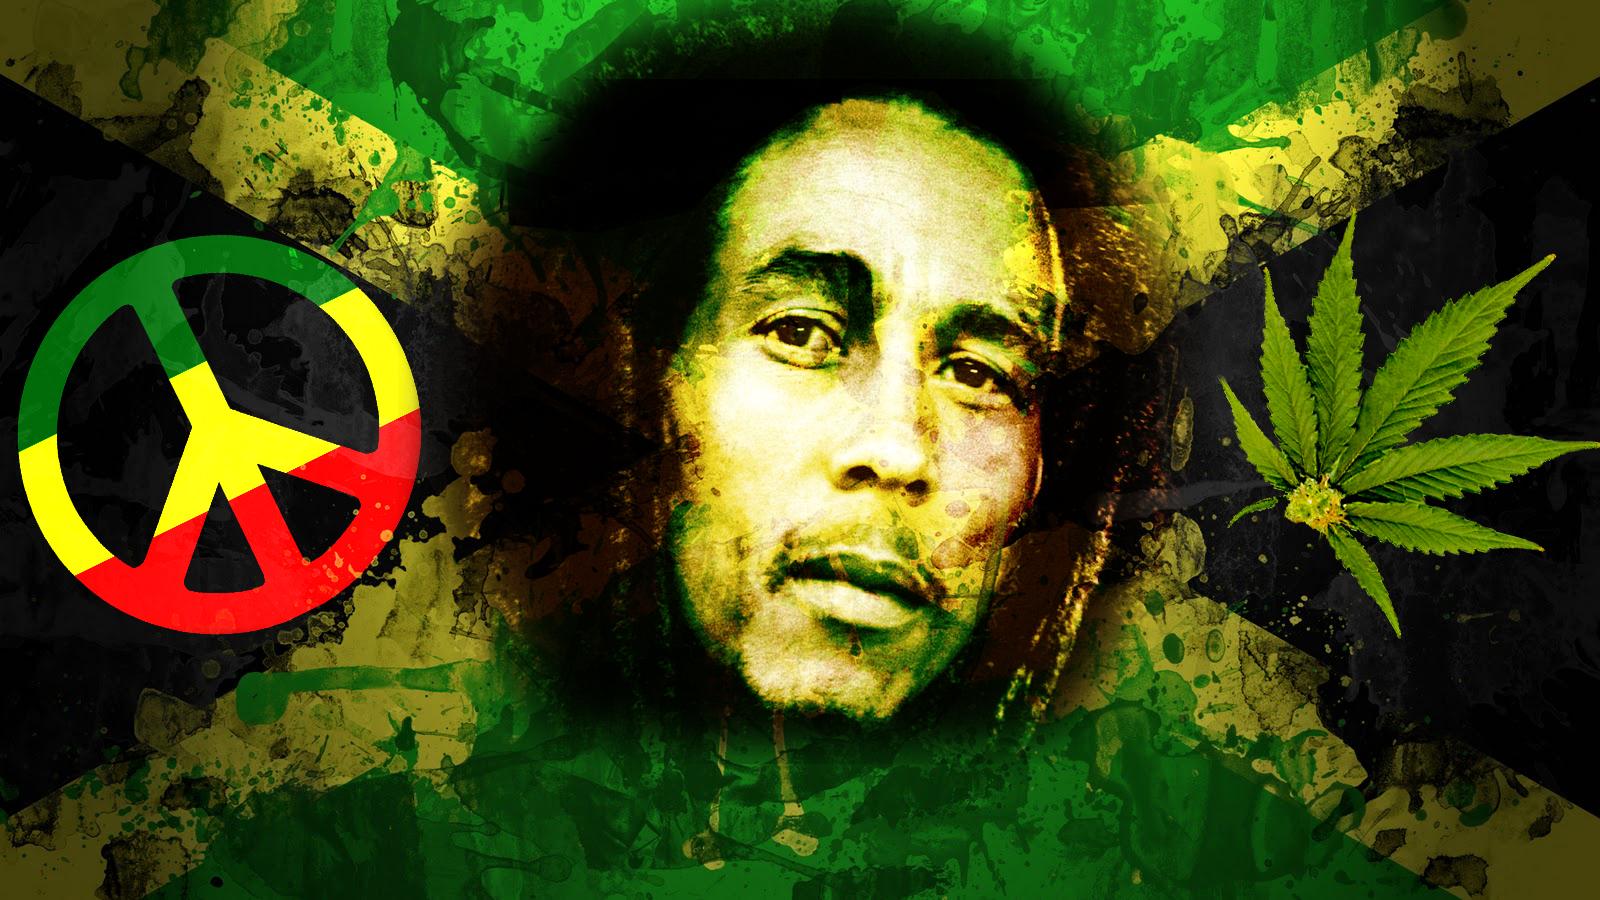 Bob Marley by mihaiart on DeviantArt